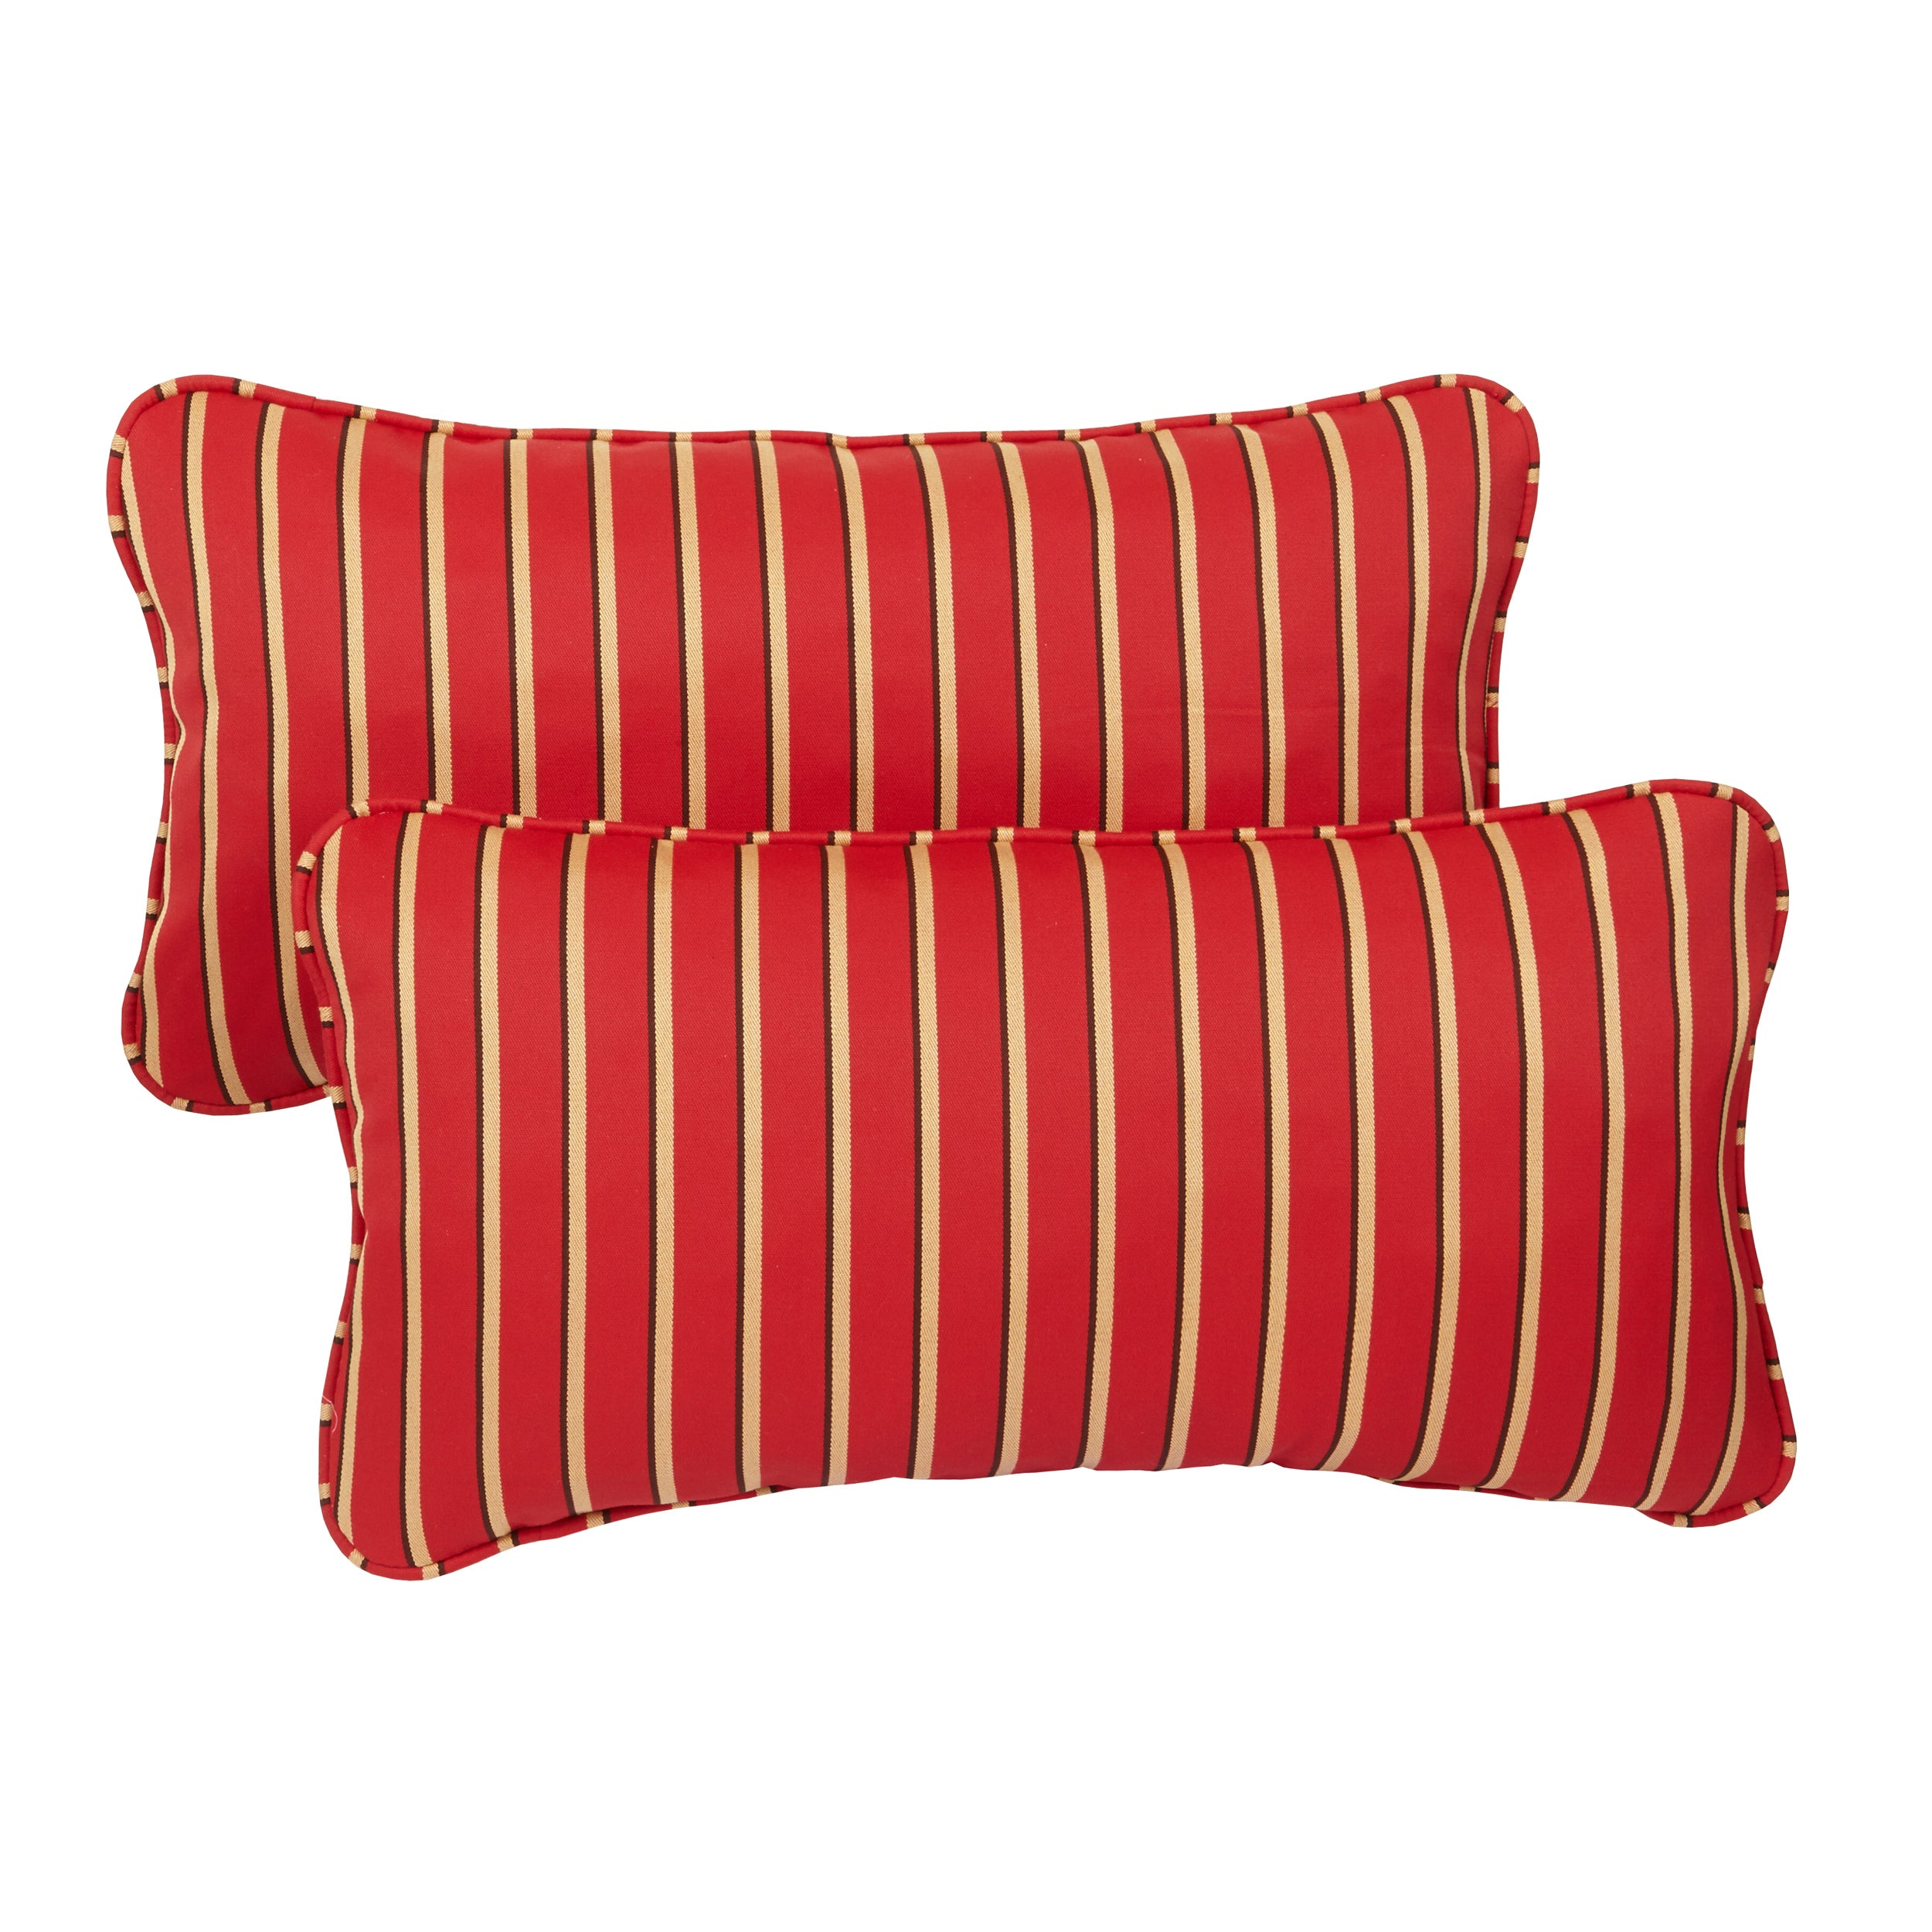 home marissa lumbar pdp pillow decor pillows indoor indooroutdoor outdoor